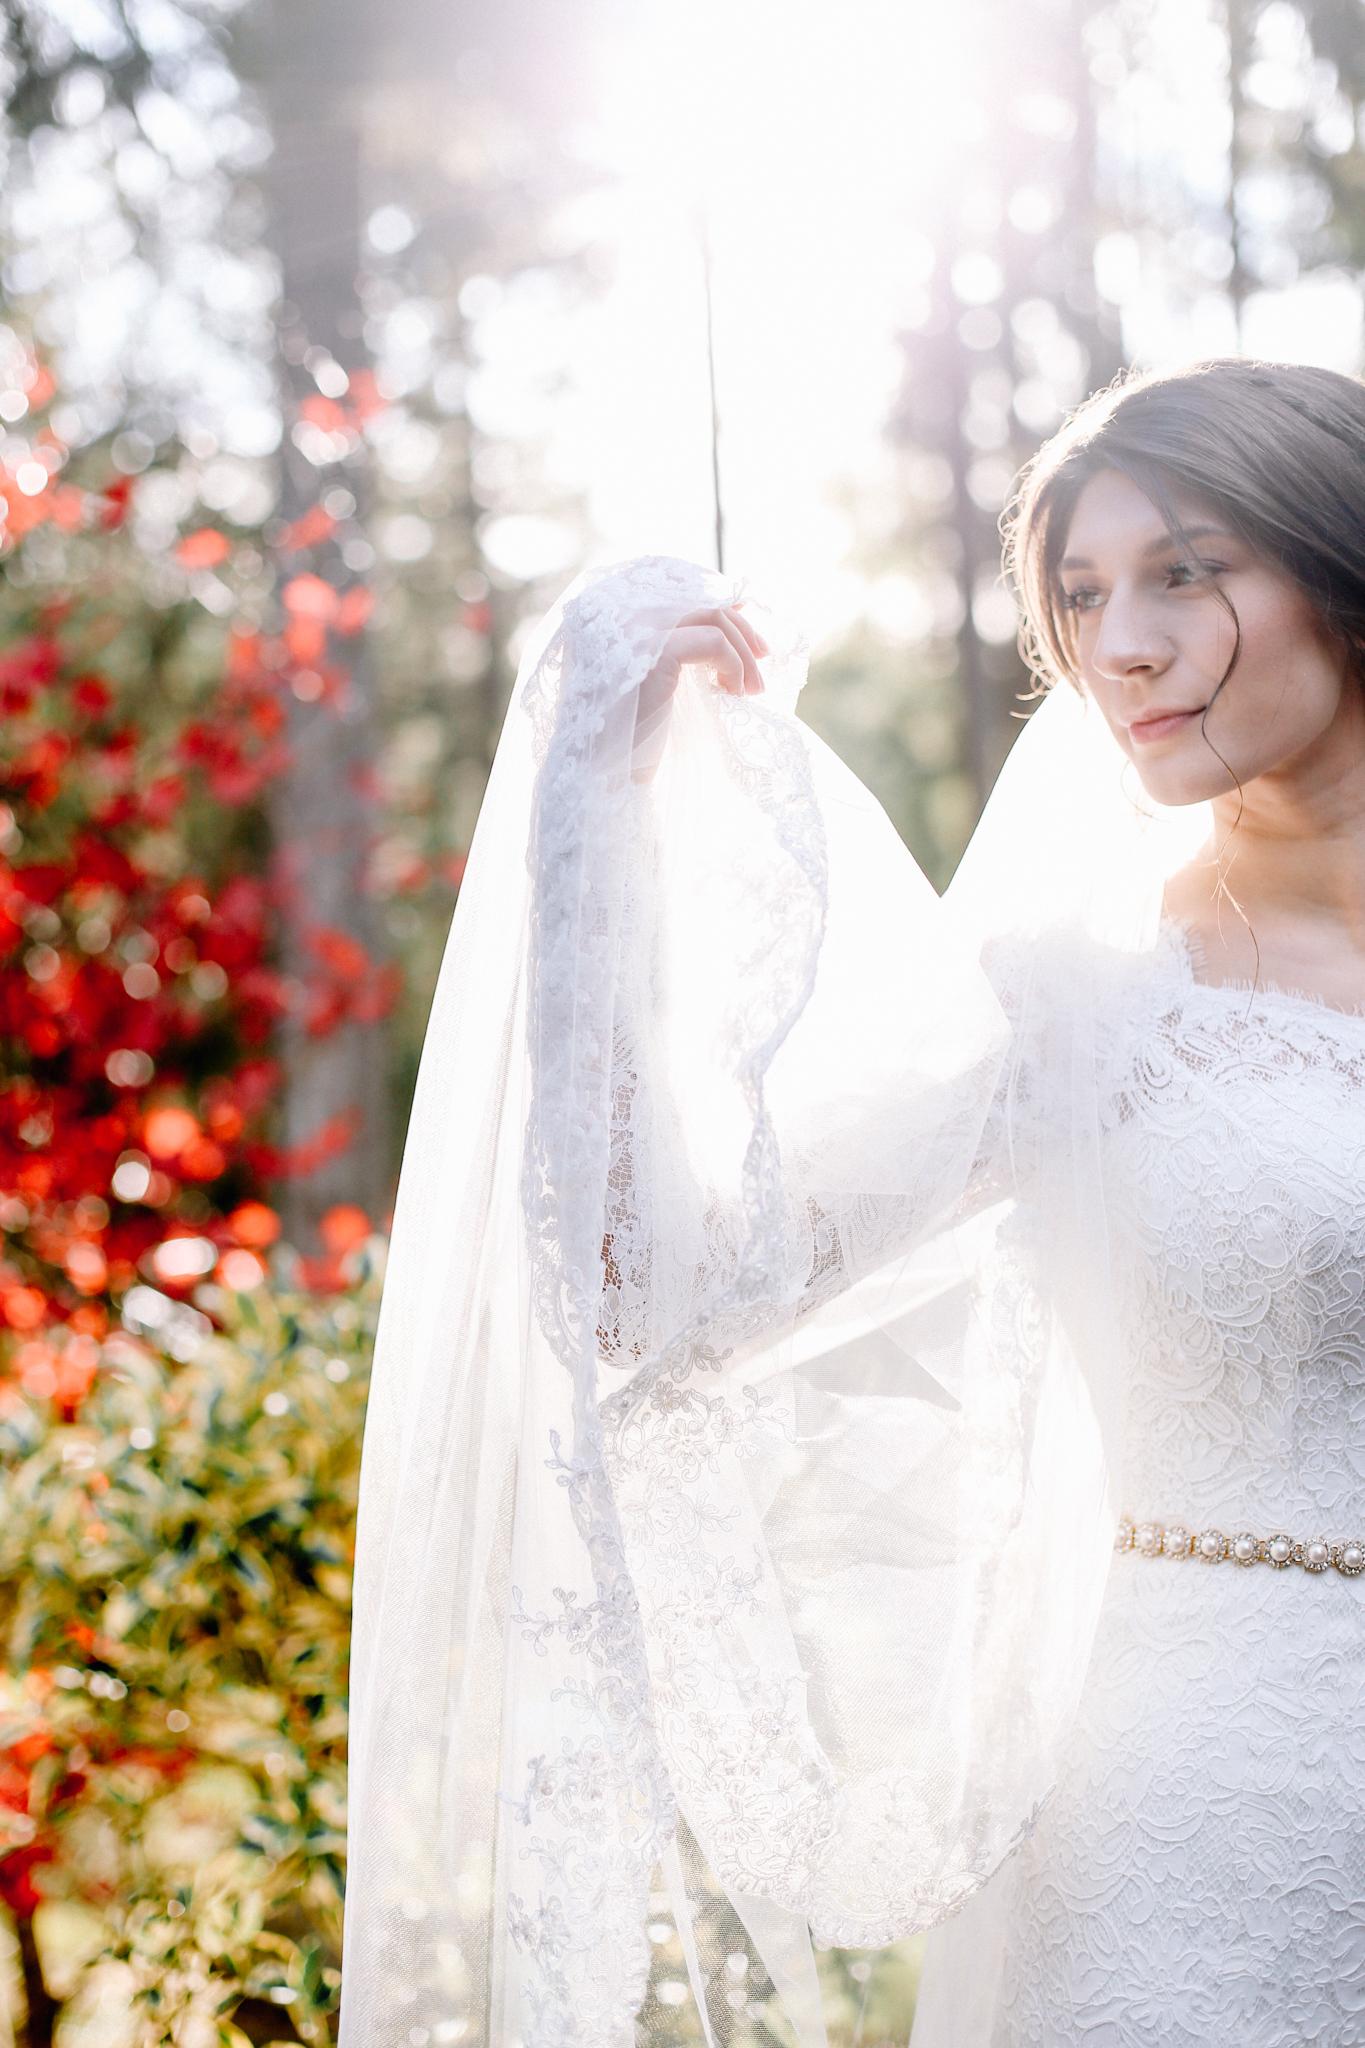 Manu and Laura - Portland Wedding Photographer - 36.jpg